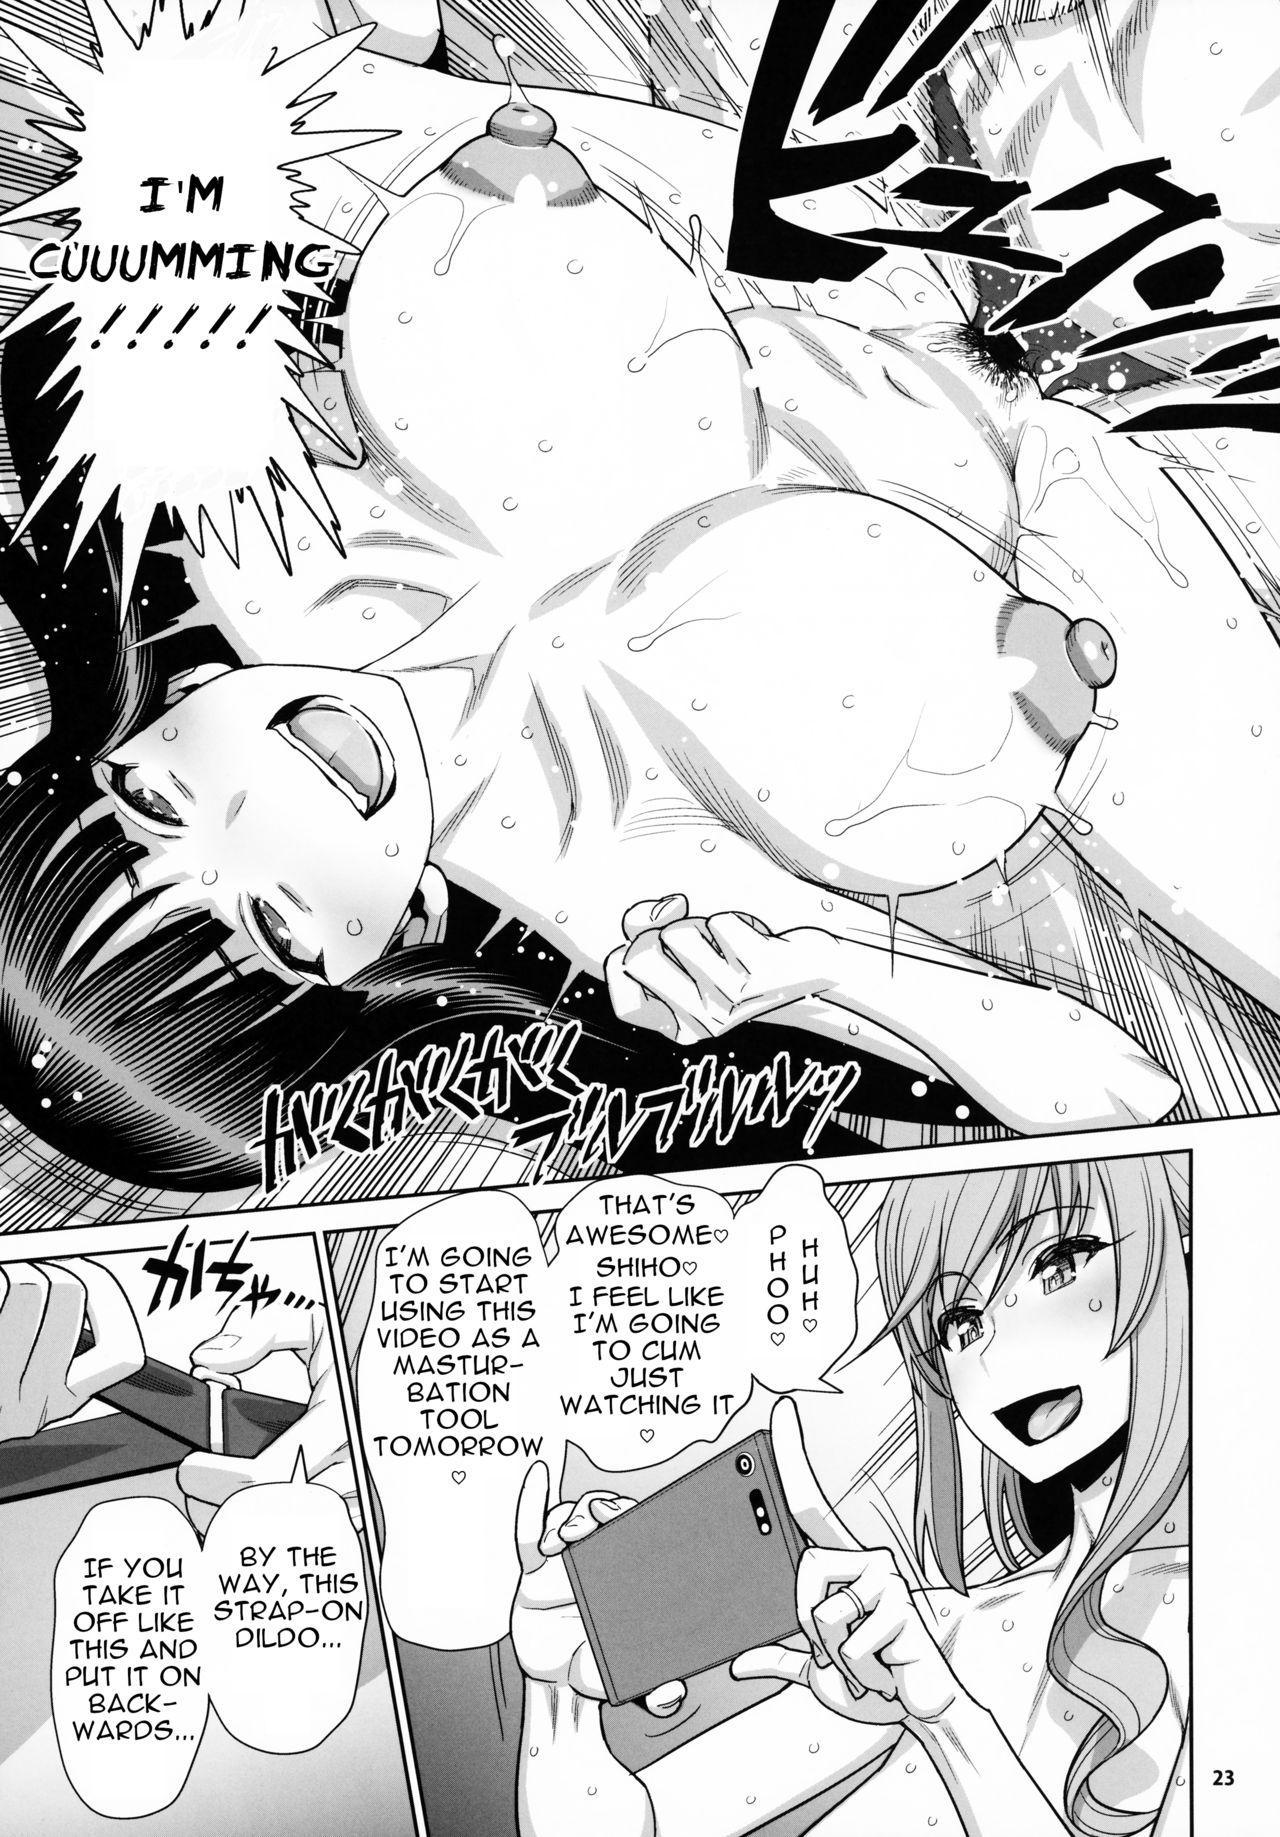 (COMIC1☆15) [Gerupin (Minazuki Juuzou, USSO)] Shimada-ryuu VS Nishizumi-ryuu Bijukujo Lesbian Kyokugen Kougyaku Gurui | Shimada Style VS Nishizumi Style MILF Lesbian Extreme Anal Fetish (Girls und Panzer) [English] 21